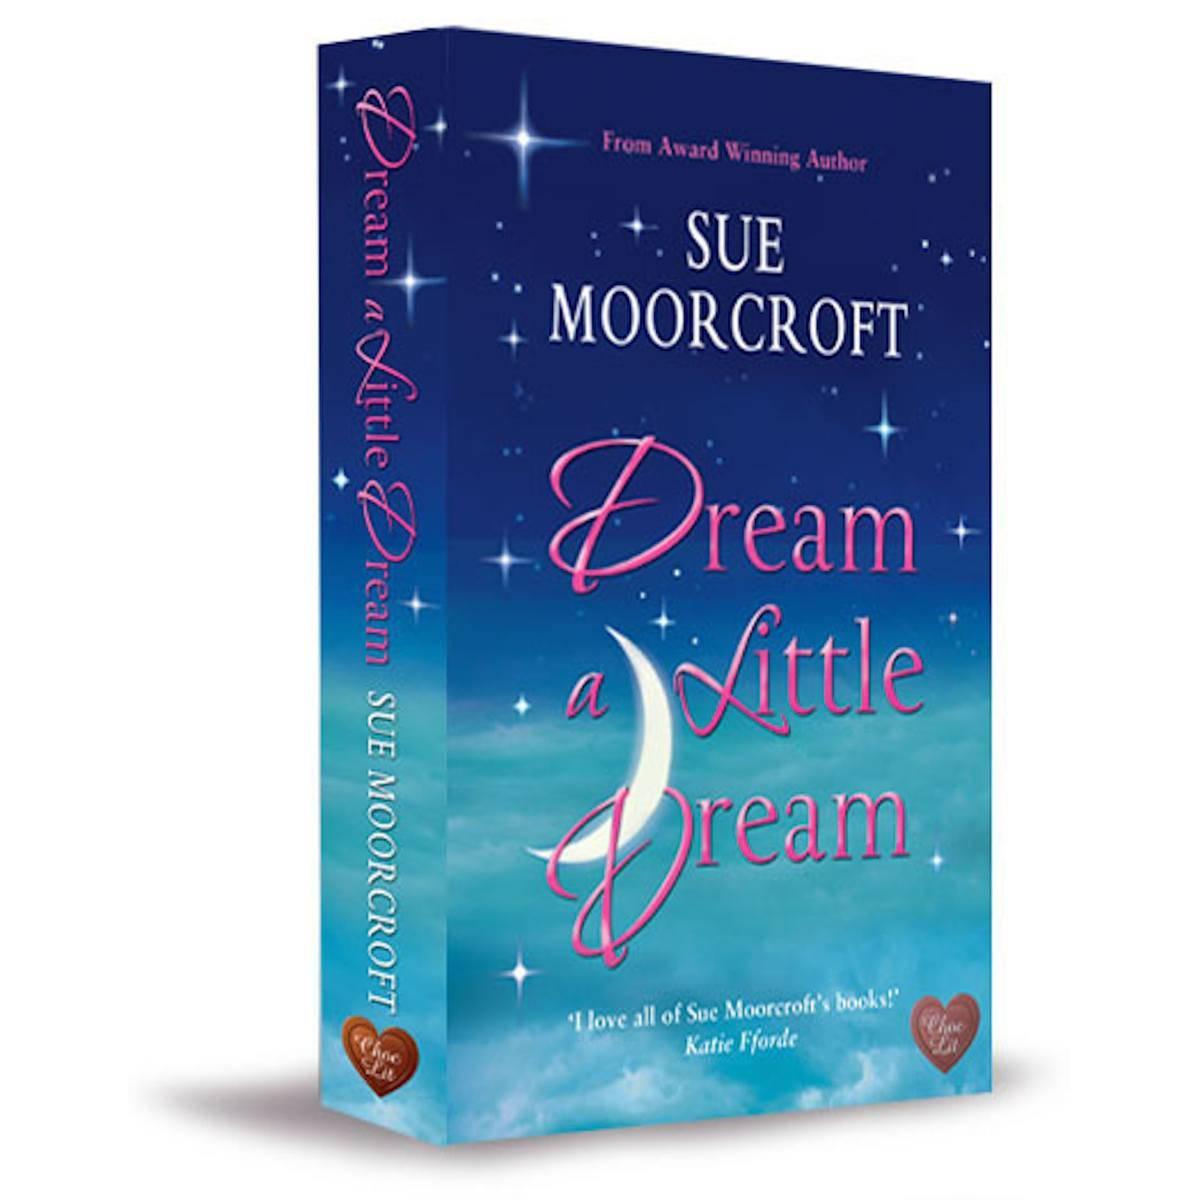 Image of Dream a Little Dream